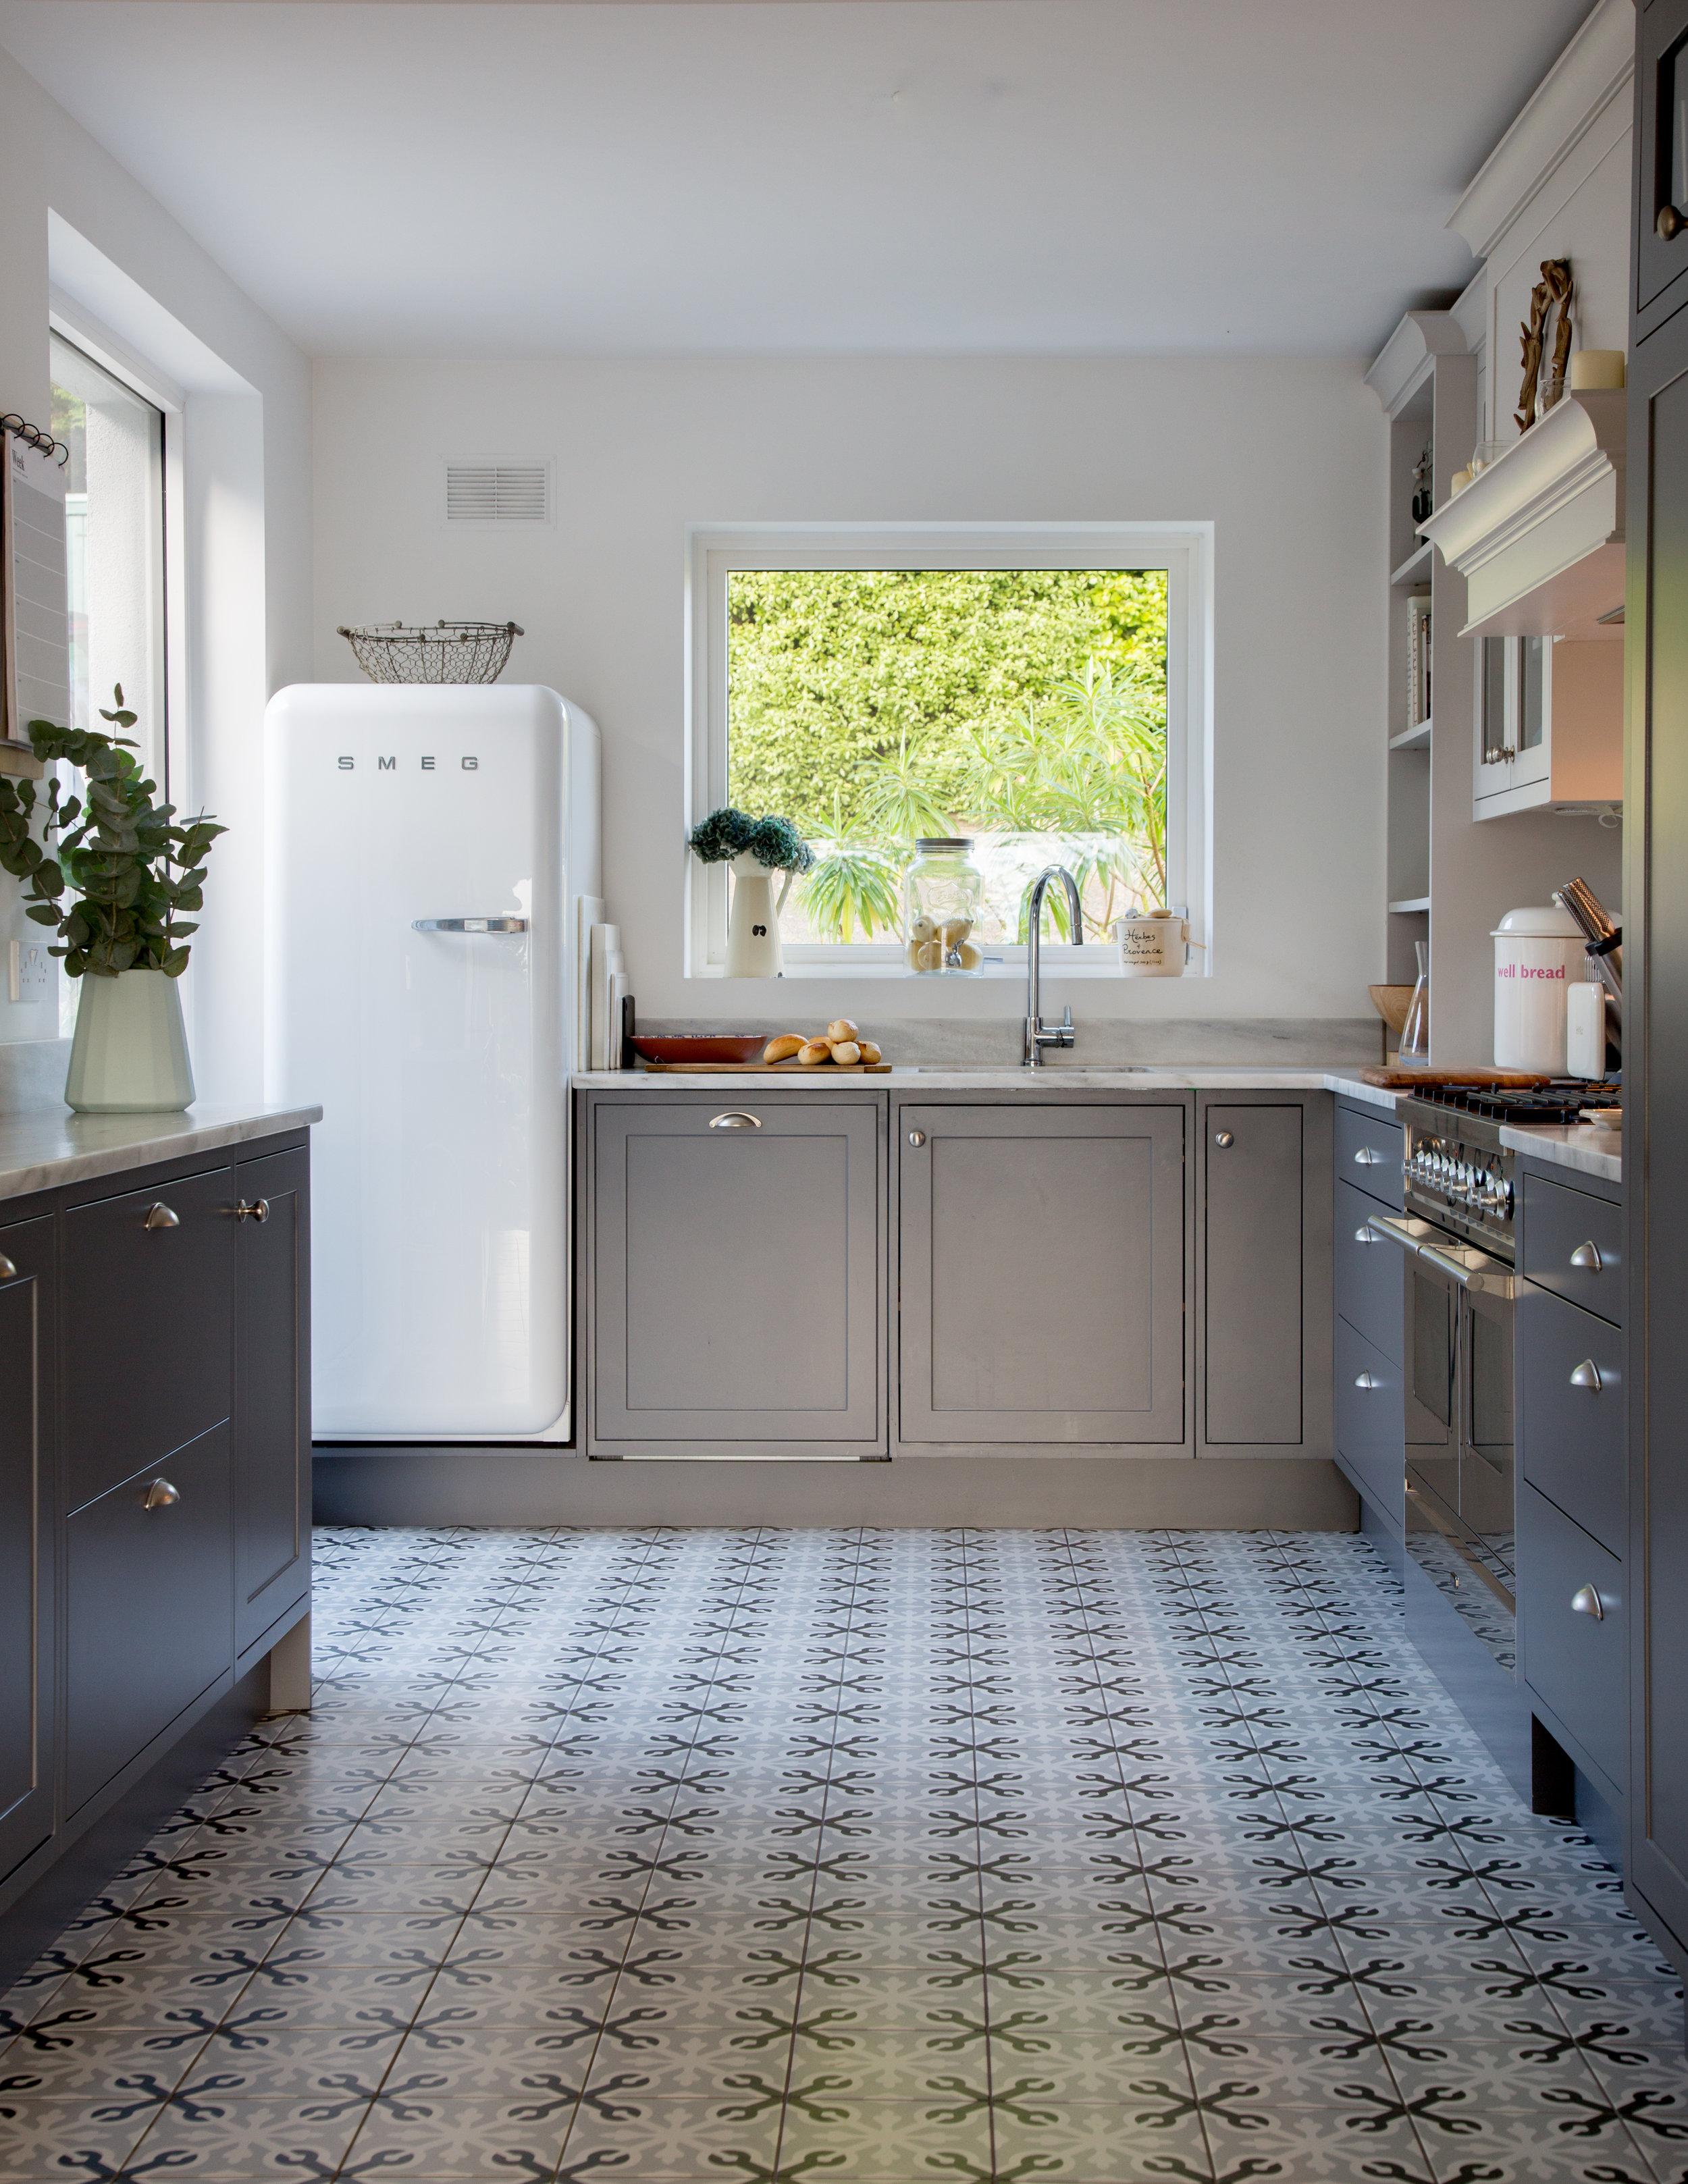 Lamb_Design_Paper_and_Moon_Emma_Lynch_Louise_Dockery_Scandi_French_Danish_homeware_Irish_business_interior_designer_patterned_tiles_kitchen.jpg